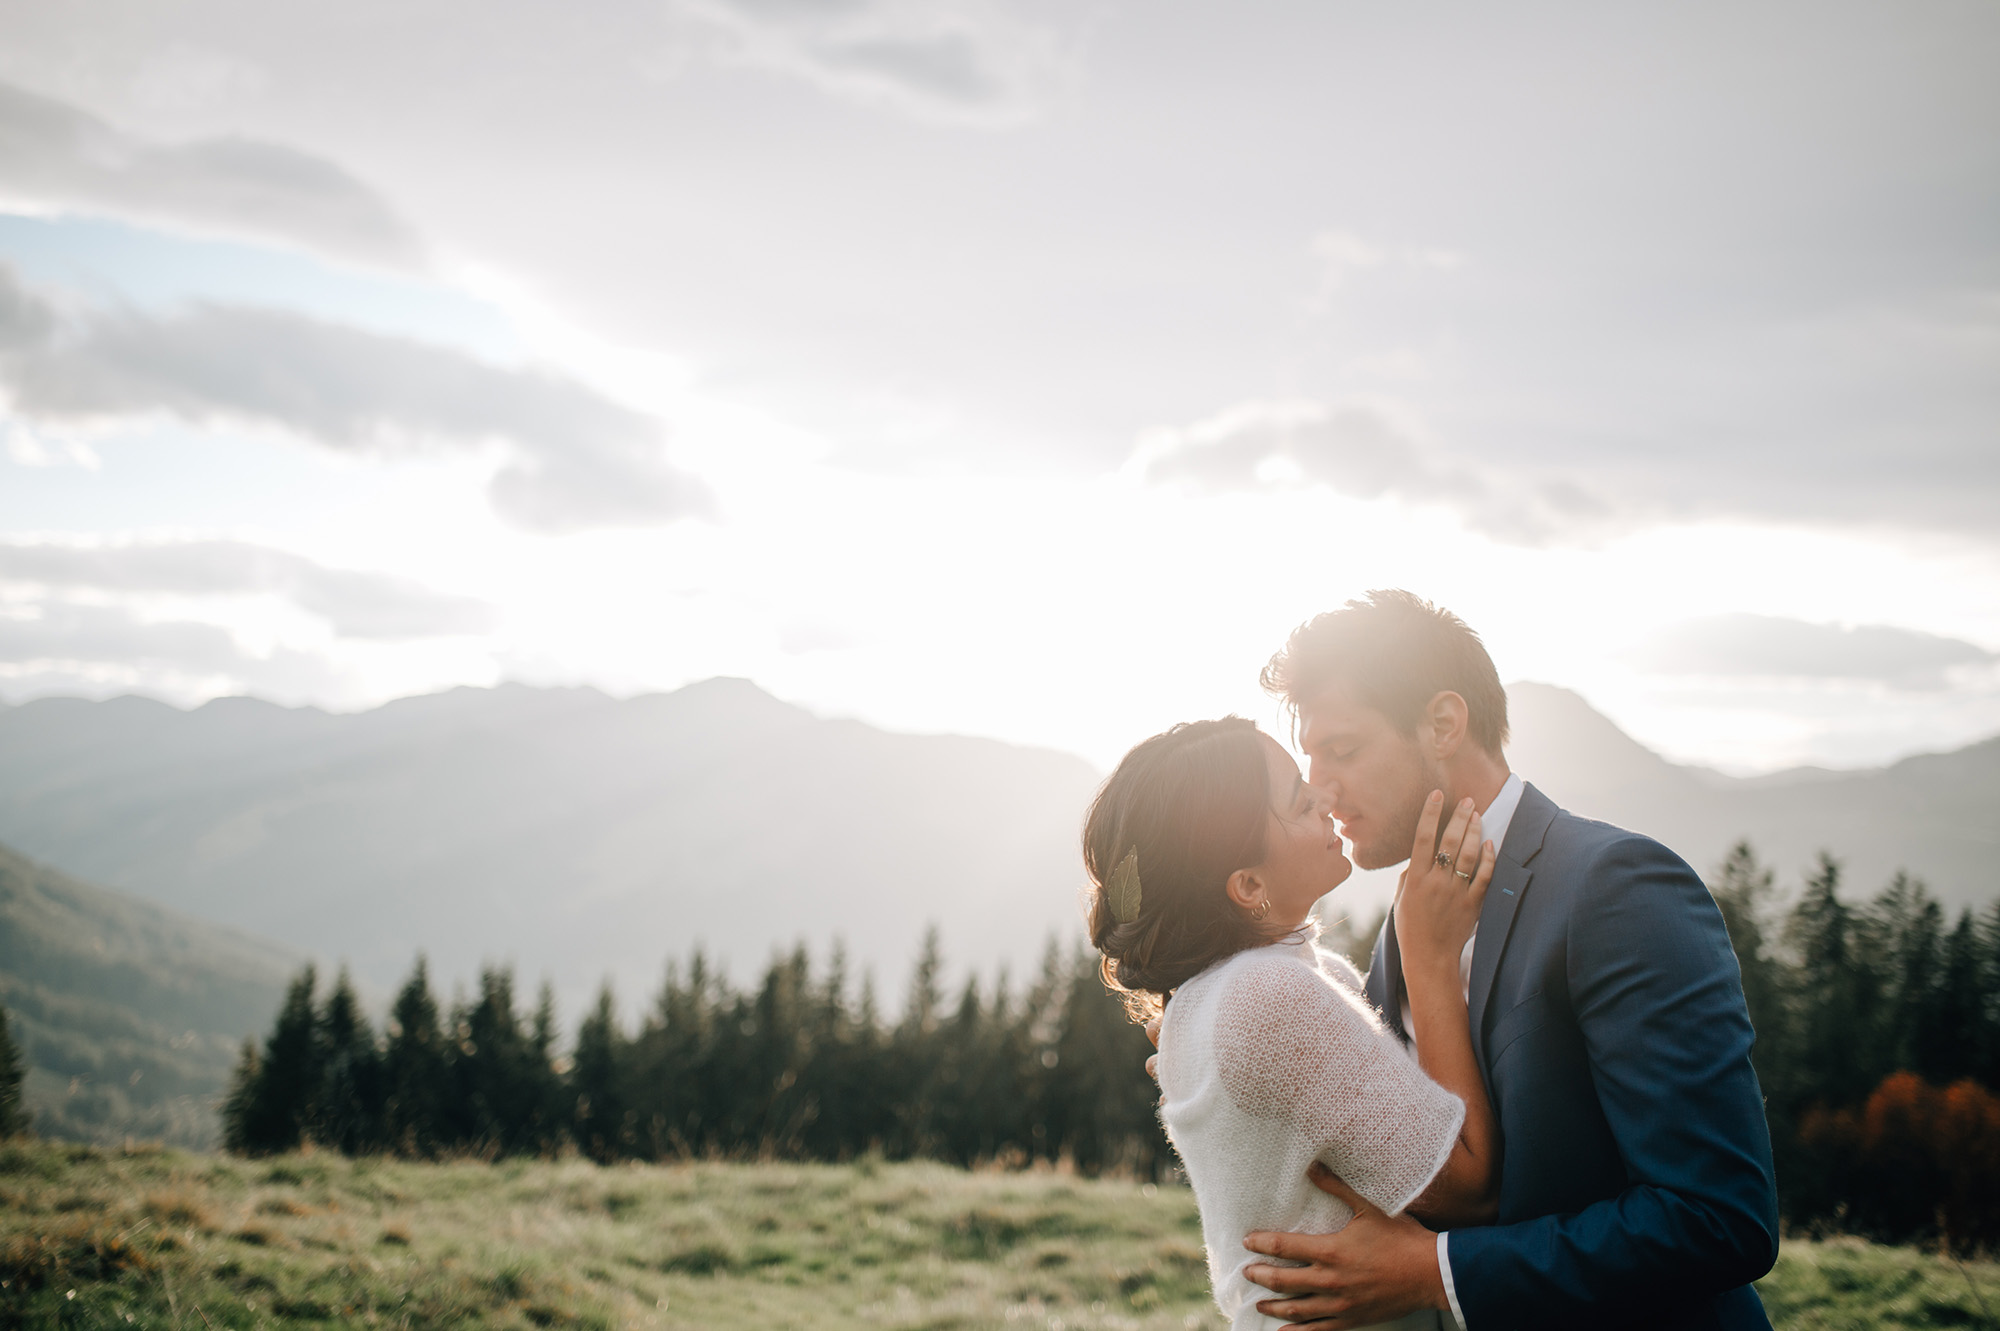 dreamotions   Hochzeitsplanung